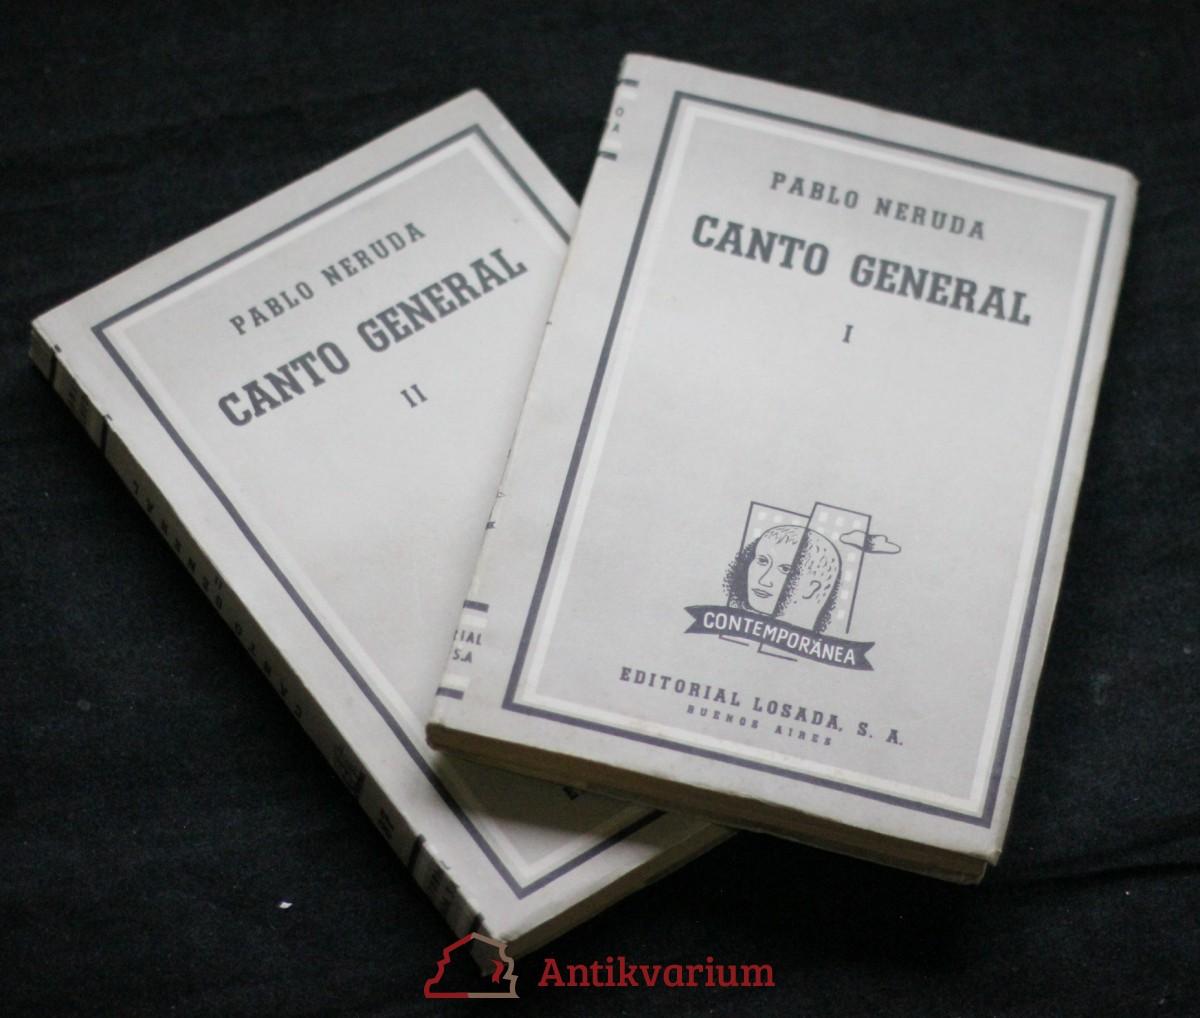 Canto general, 1.-2. díl